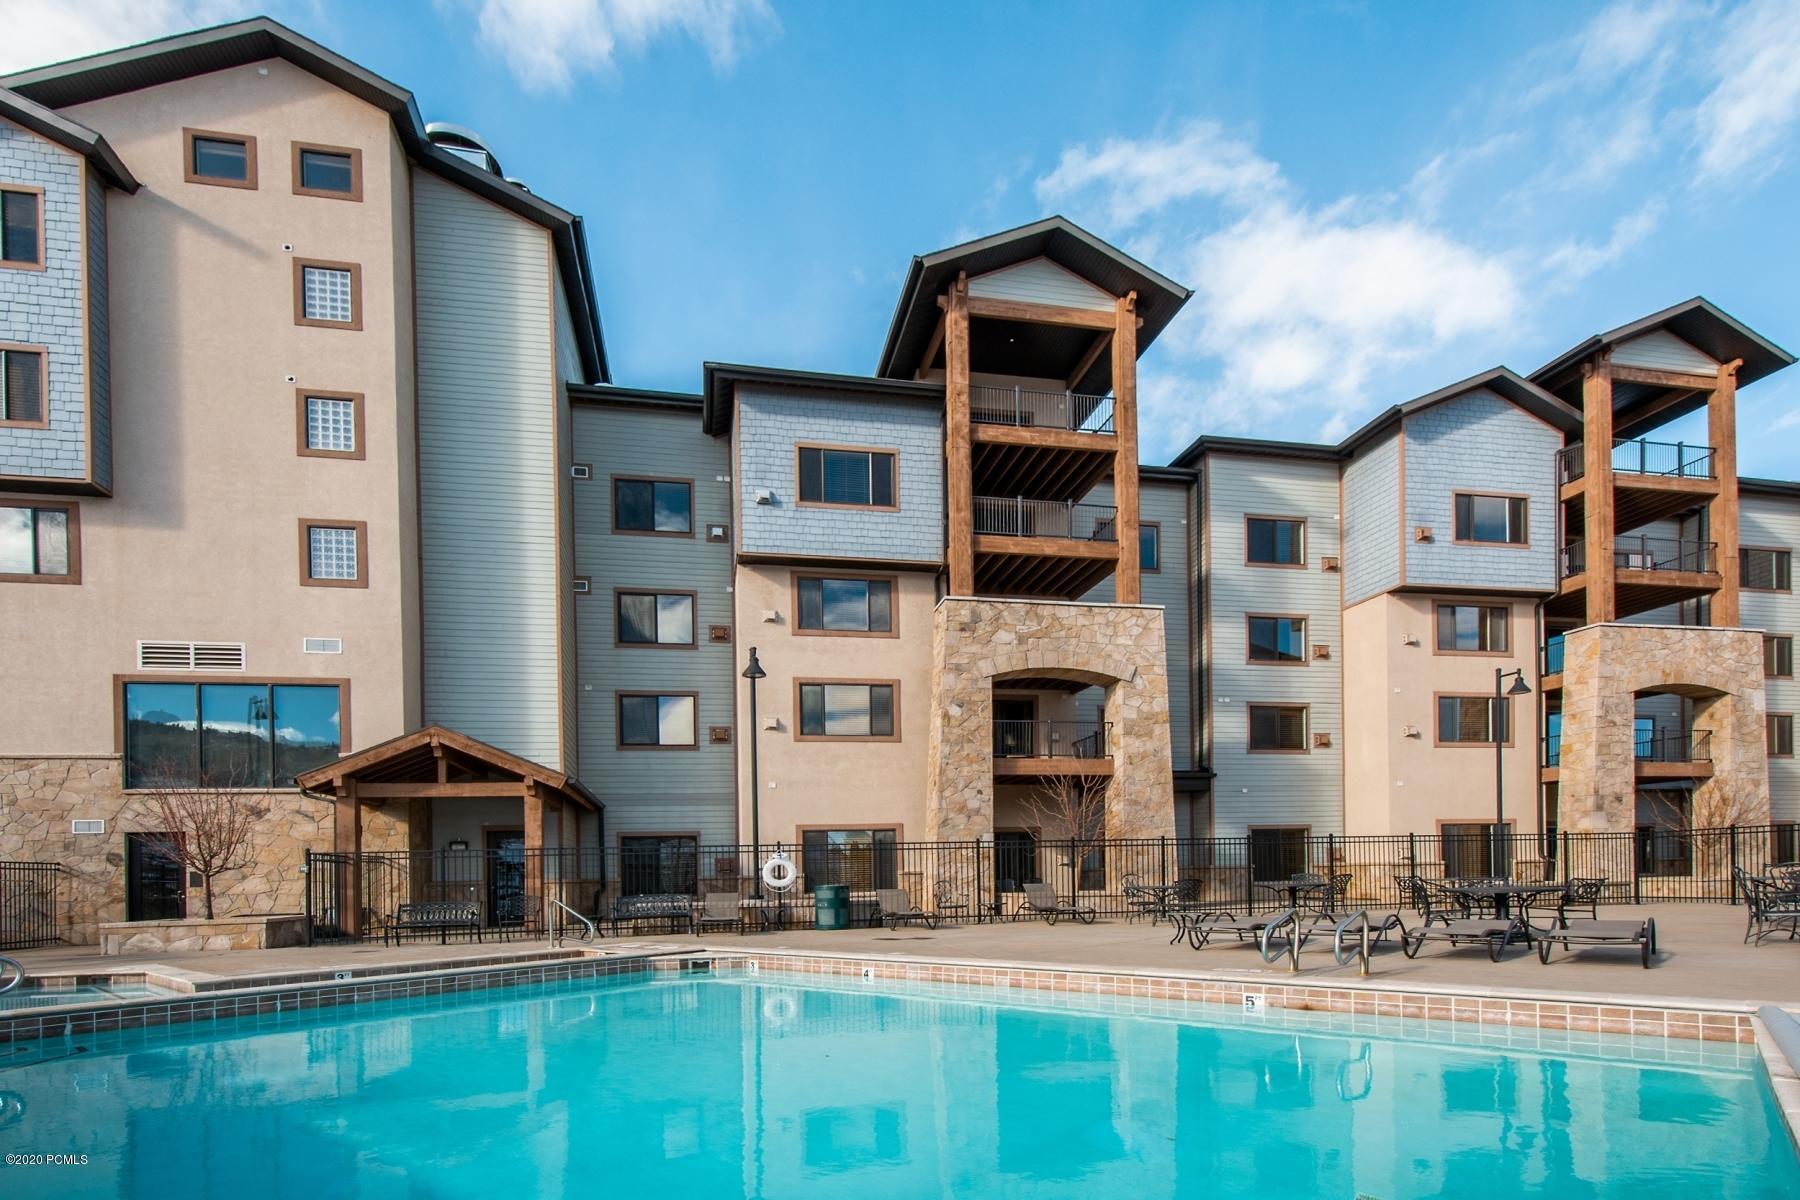 2653 Canyons Resort Drive, Park City, Utah 84098, 2 Bedrooms Bedrooms, ,3 BathroomsBathrooms,Condominium,For Sale,Canyons Resort,12002776